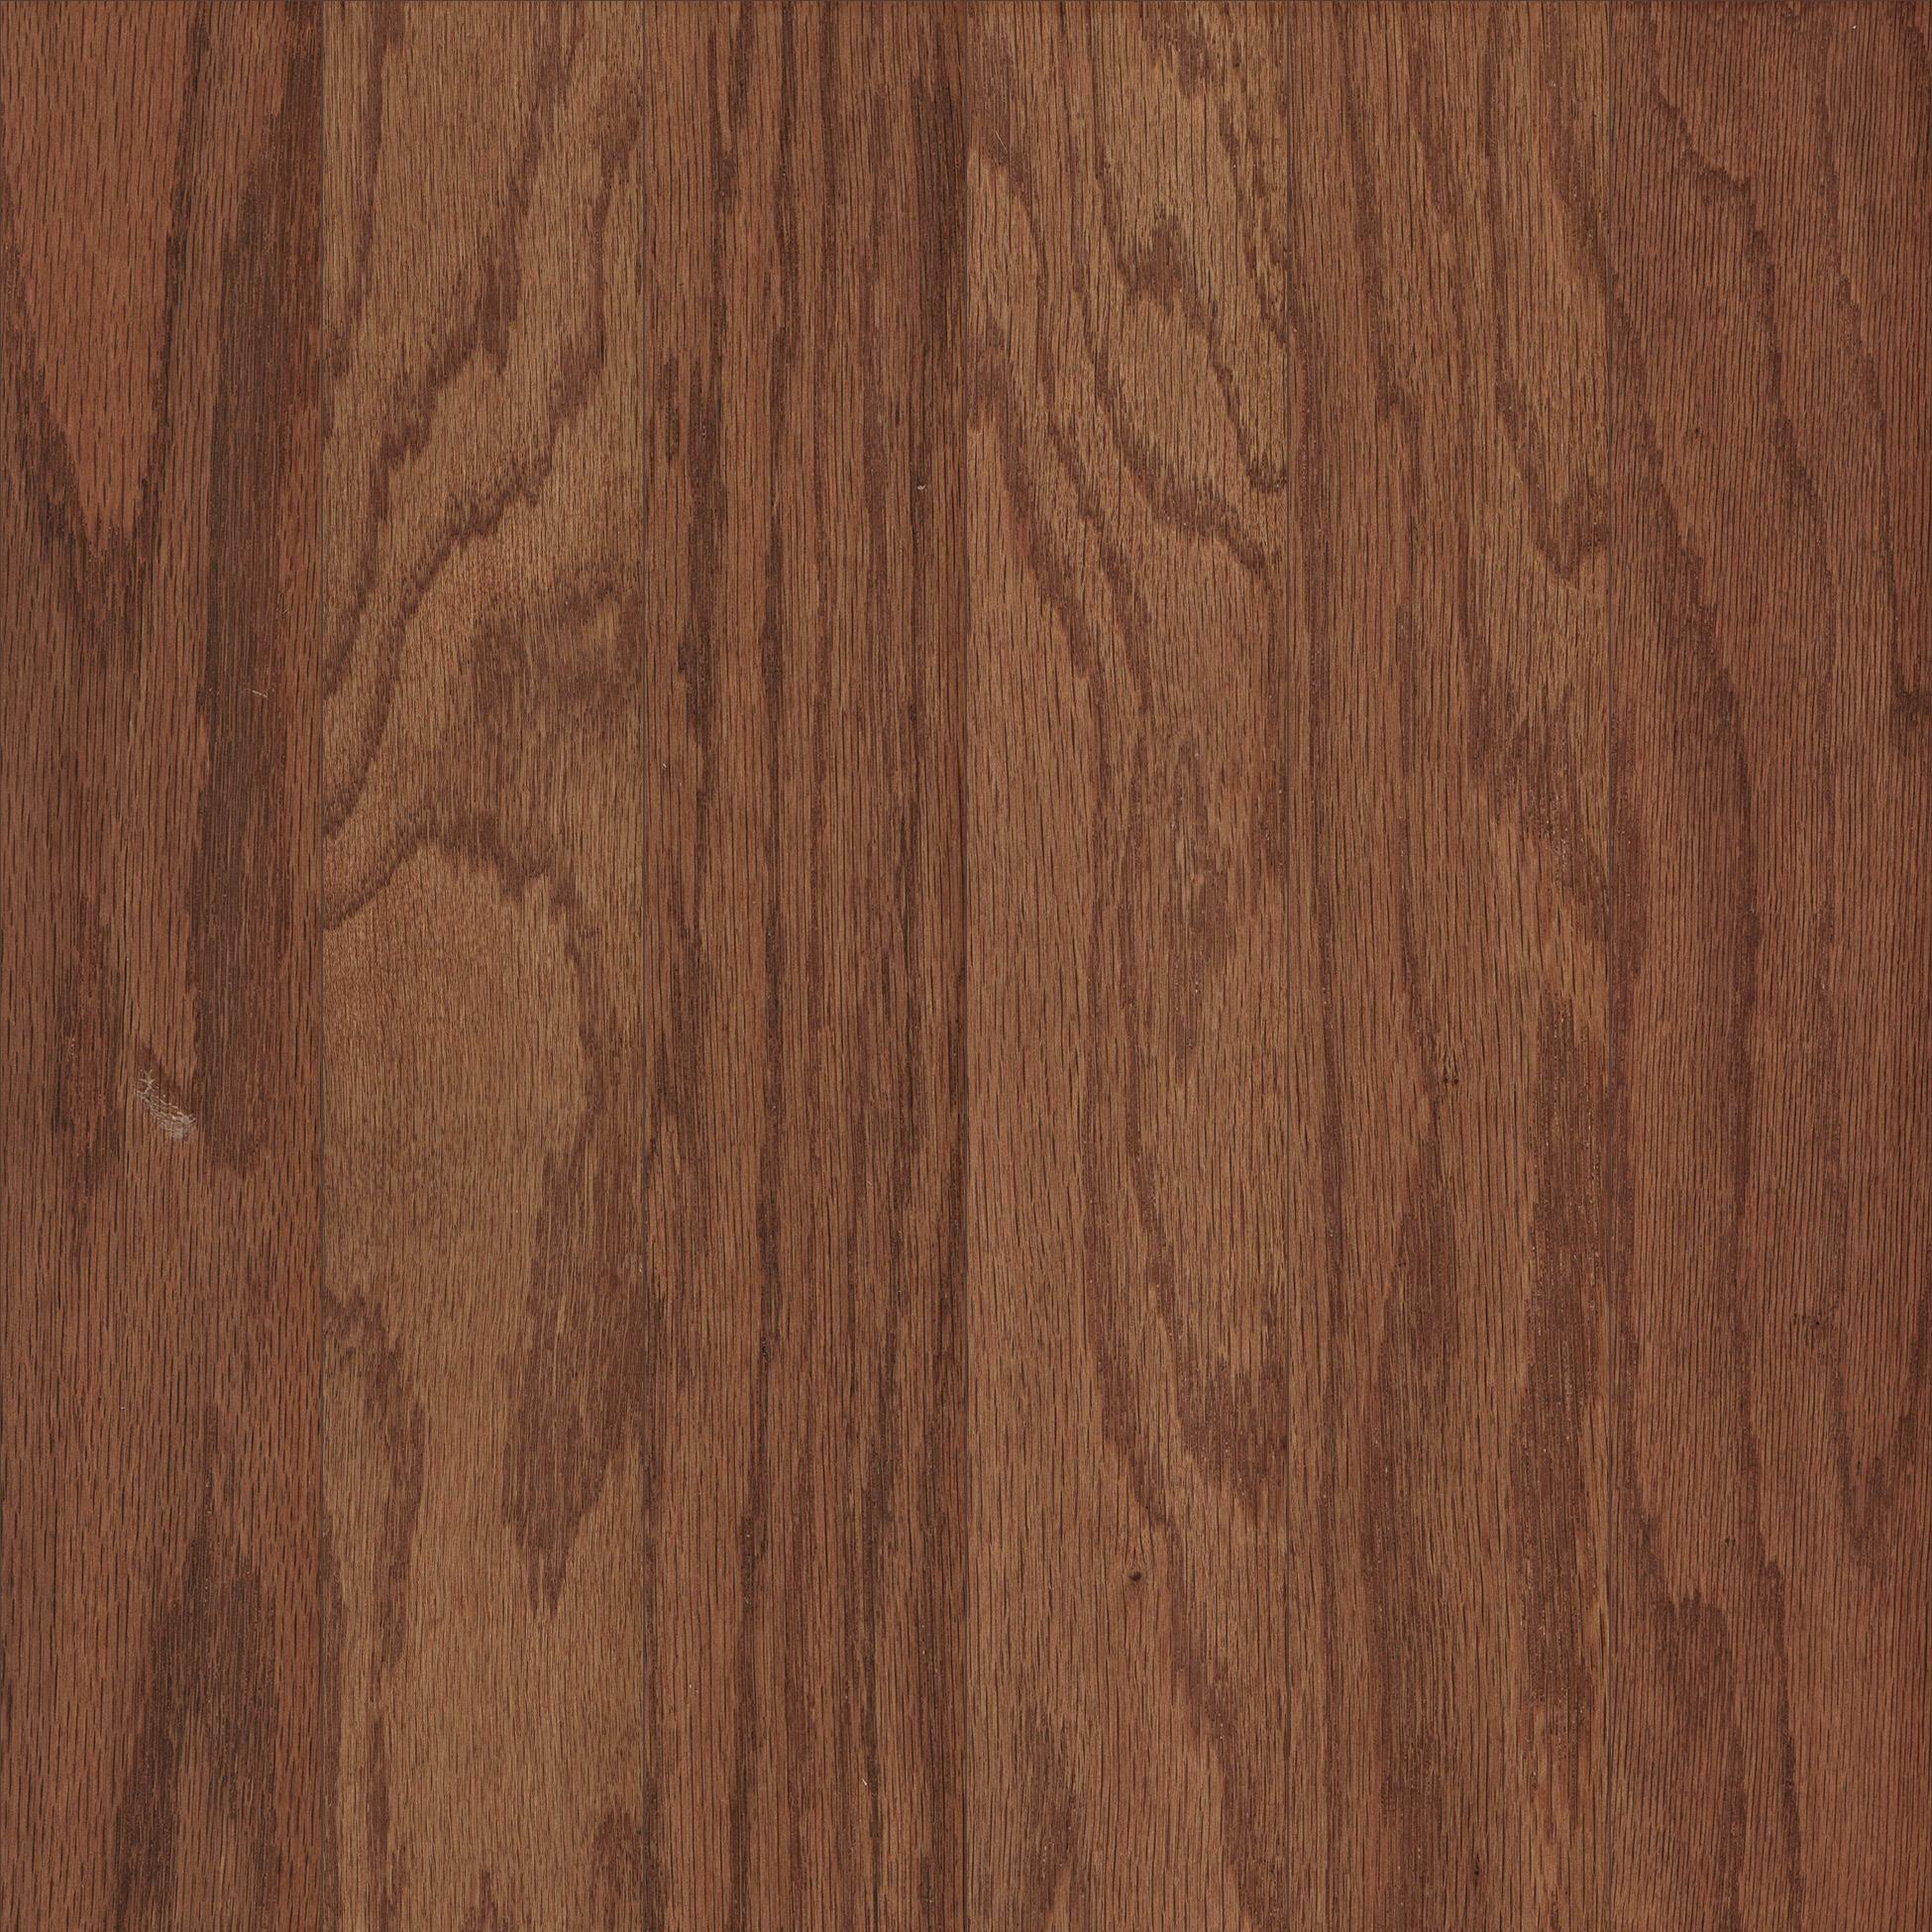 Mohawk Flooring Vacuum: Mohawk Brandymill Pastiche Oak Golden Click Together